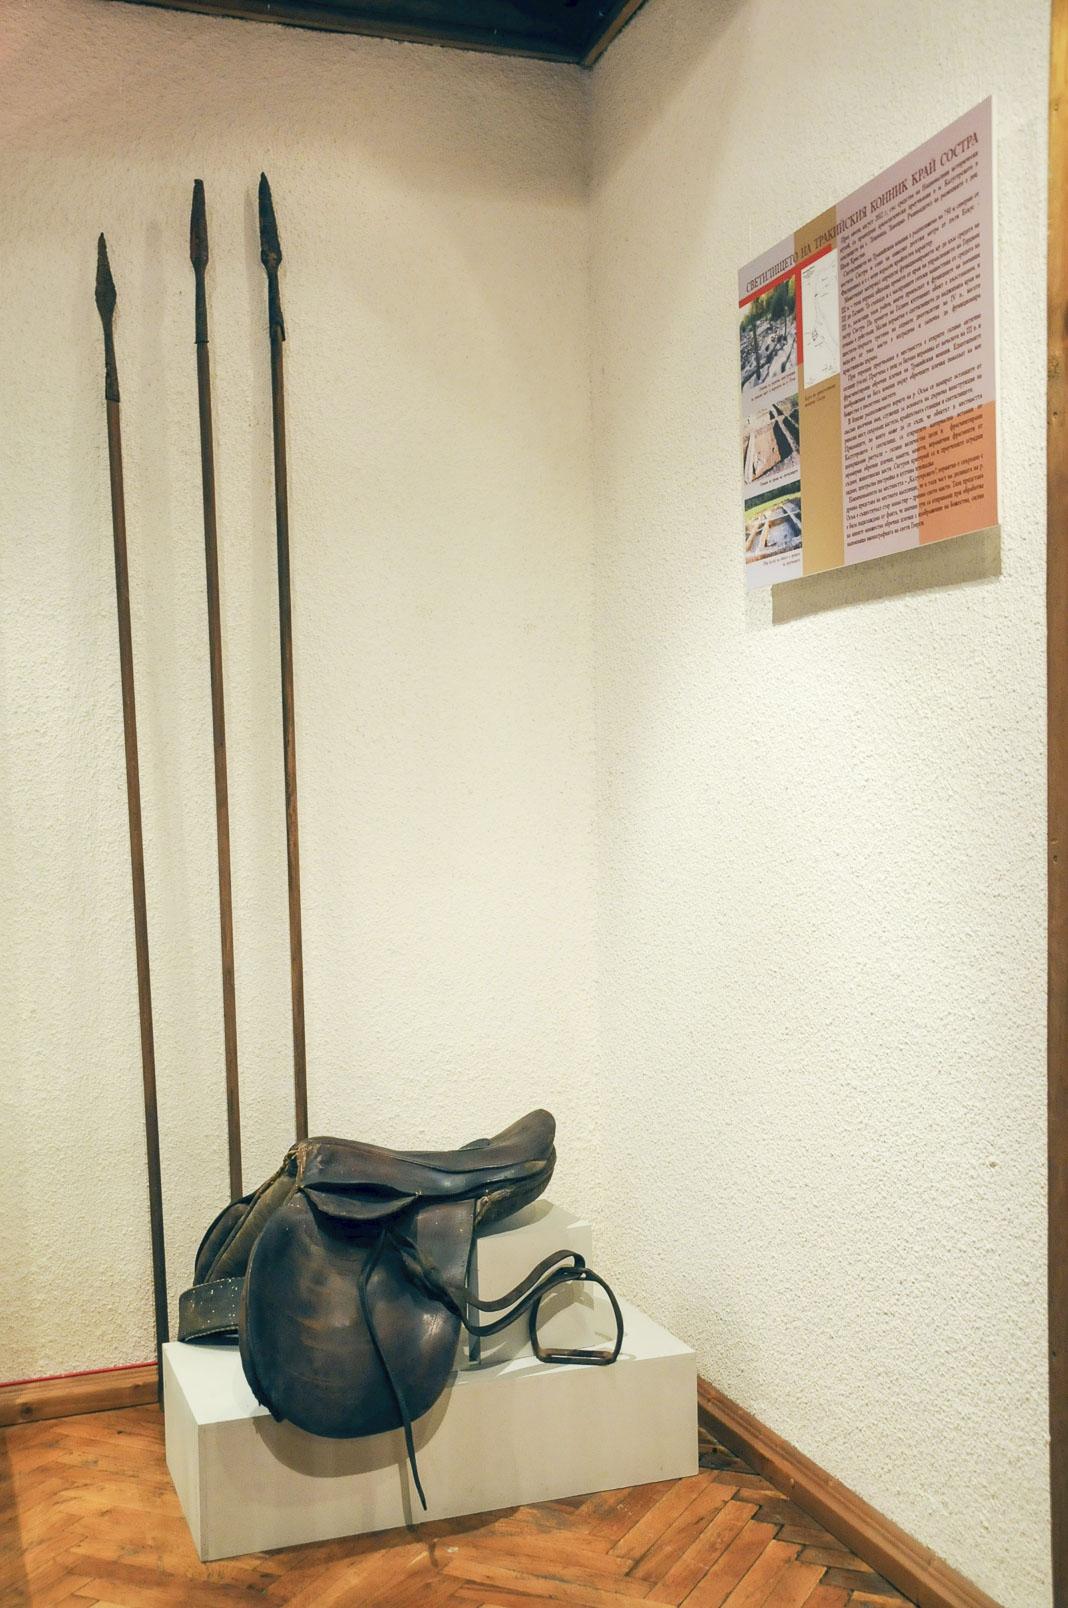 troyan-museum-jivotat-na-edna-idea-24